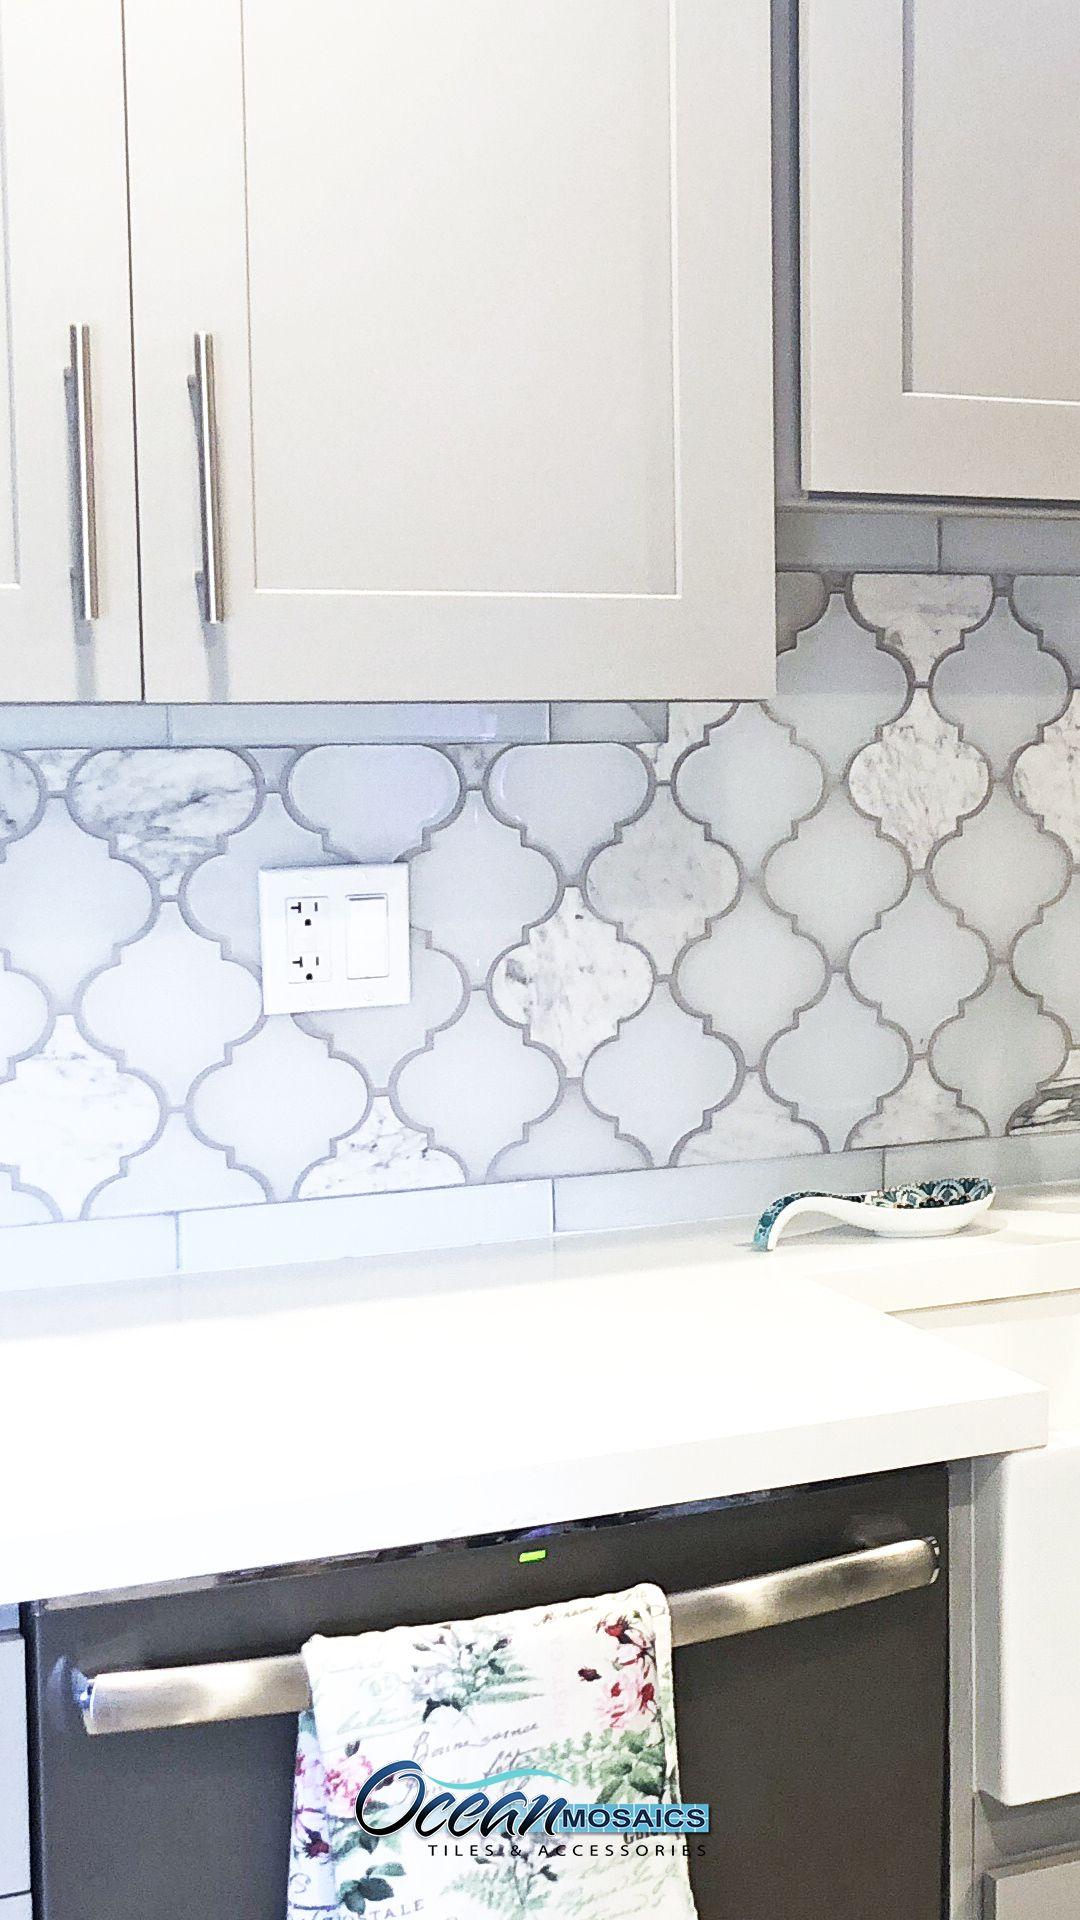 arabesque kitchen backsplash tile